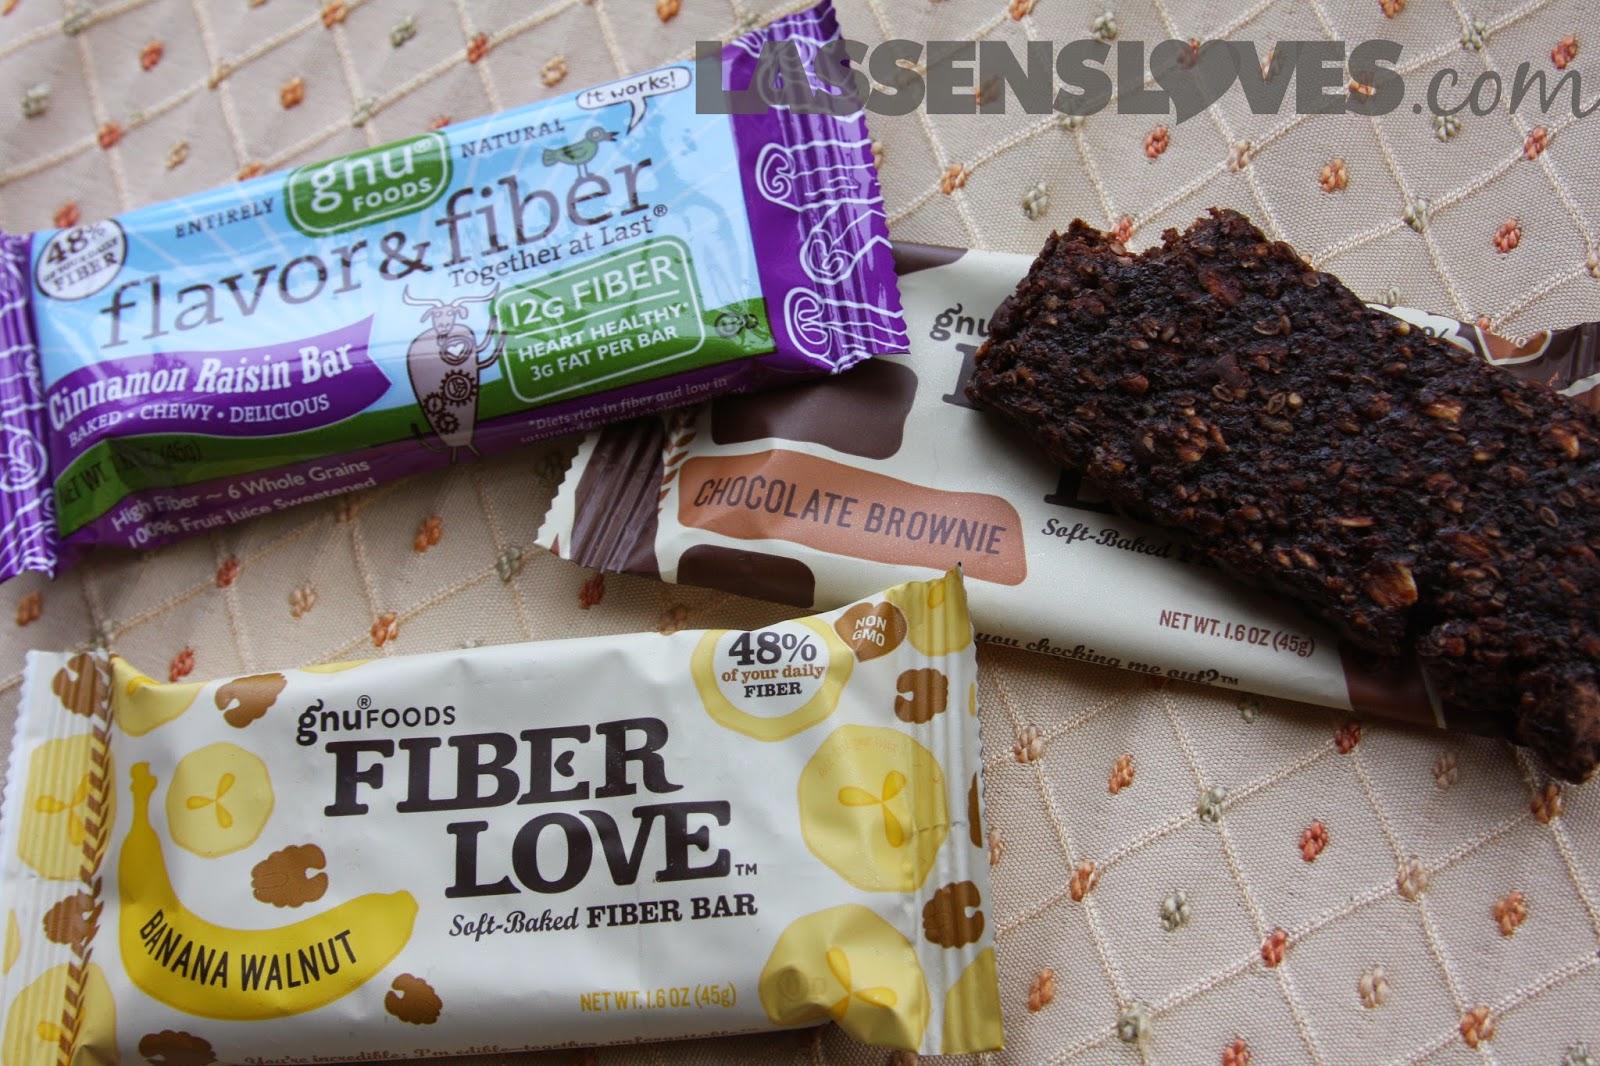 How+to+choose+an+energy+bar, high+fiber+bar, gnu+foods